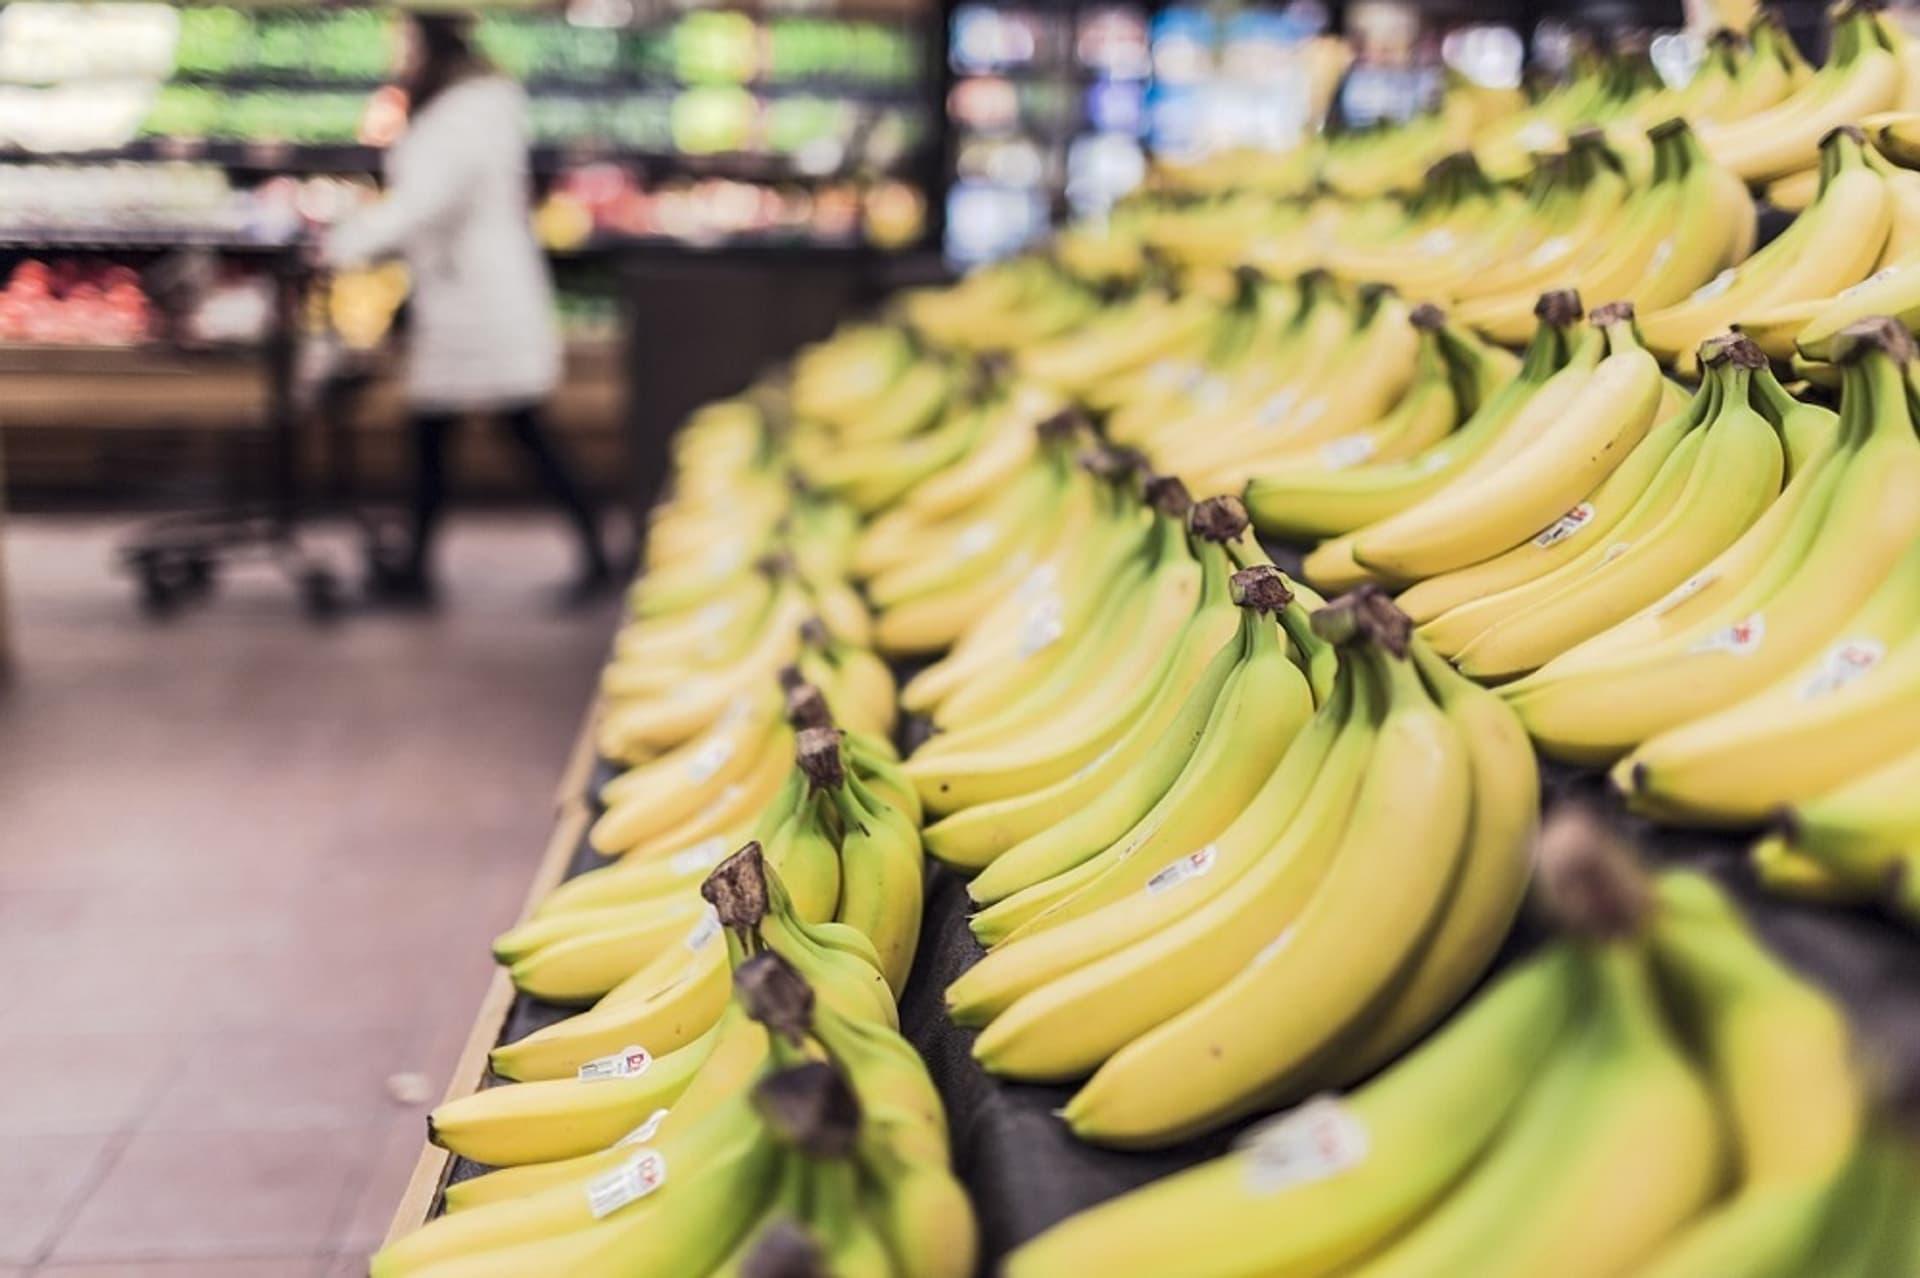 Bananen Supermarkt Discounter c Pixabay Stock Snap